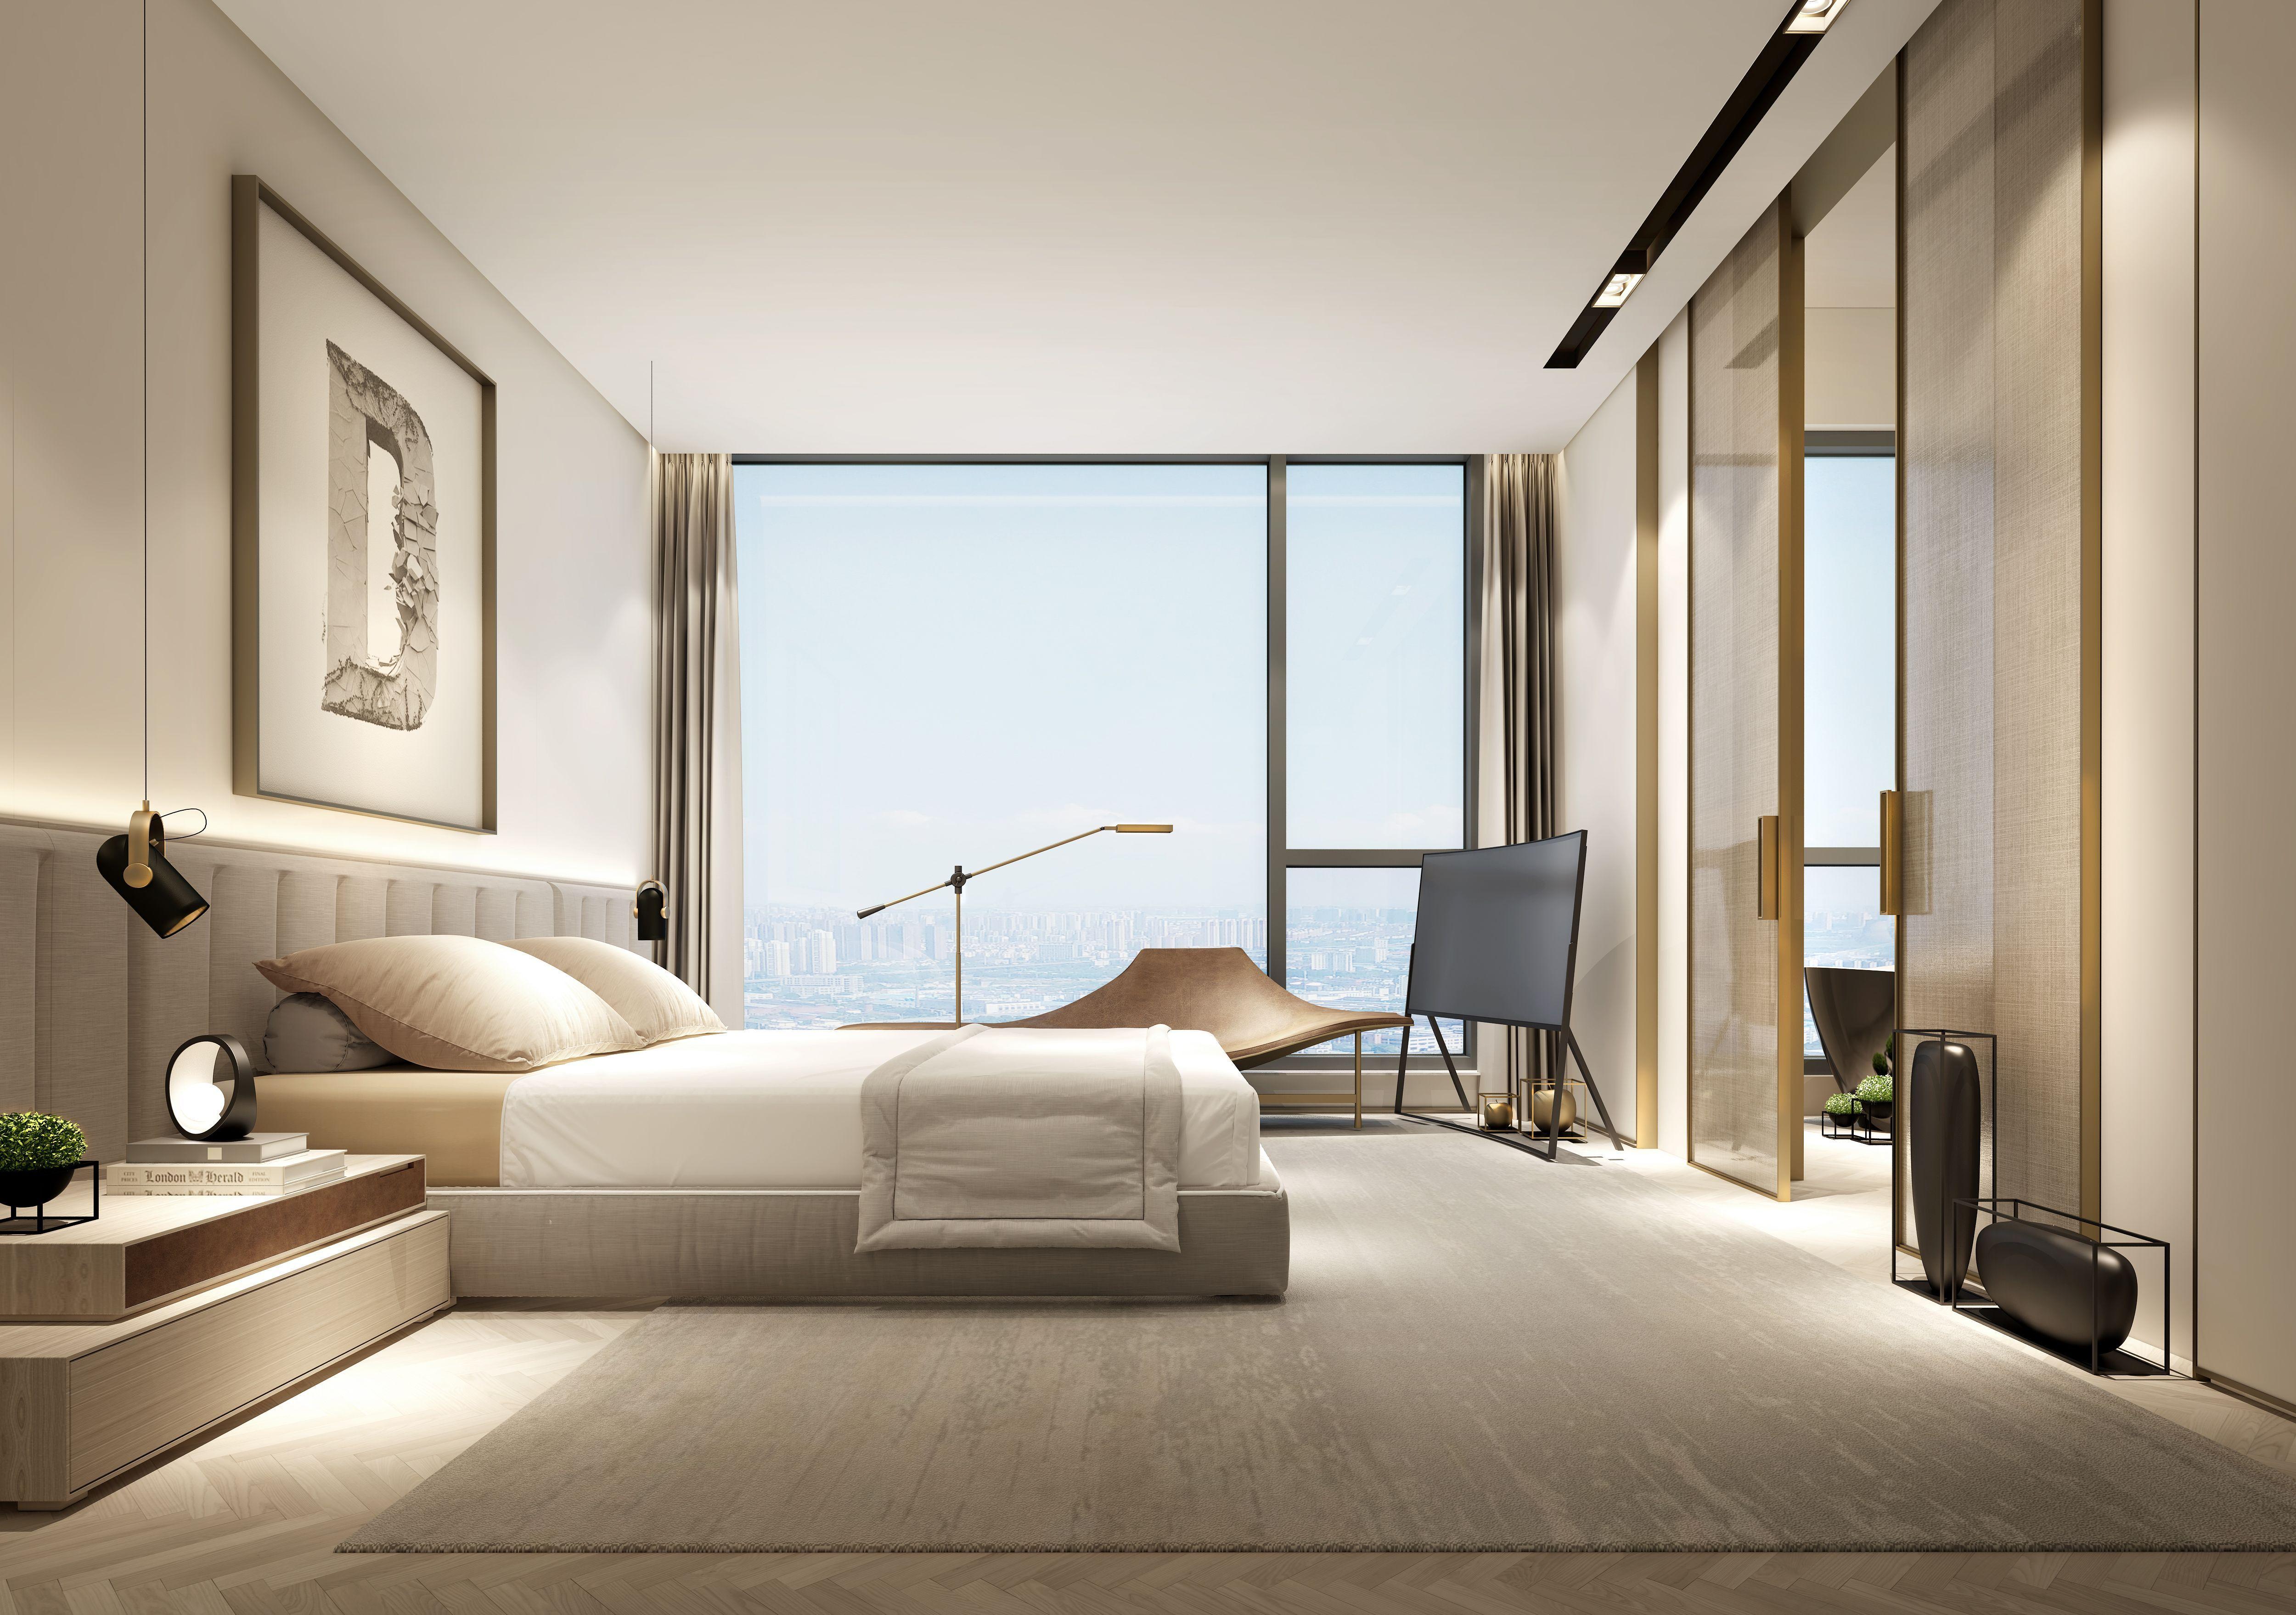 Home Designs Bedroom Interior Master Bedroom Interior Master Bedrooms Decor Interior home design bedroom